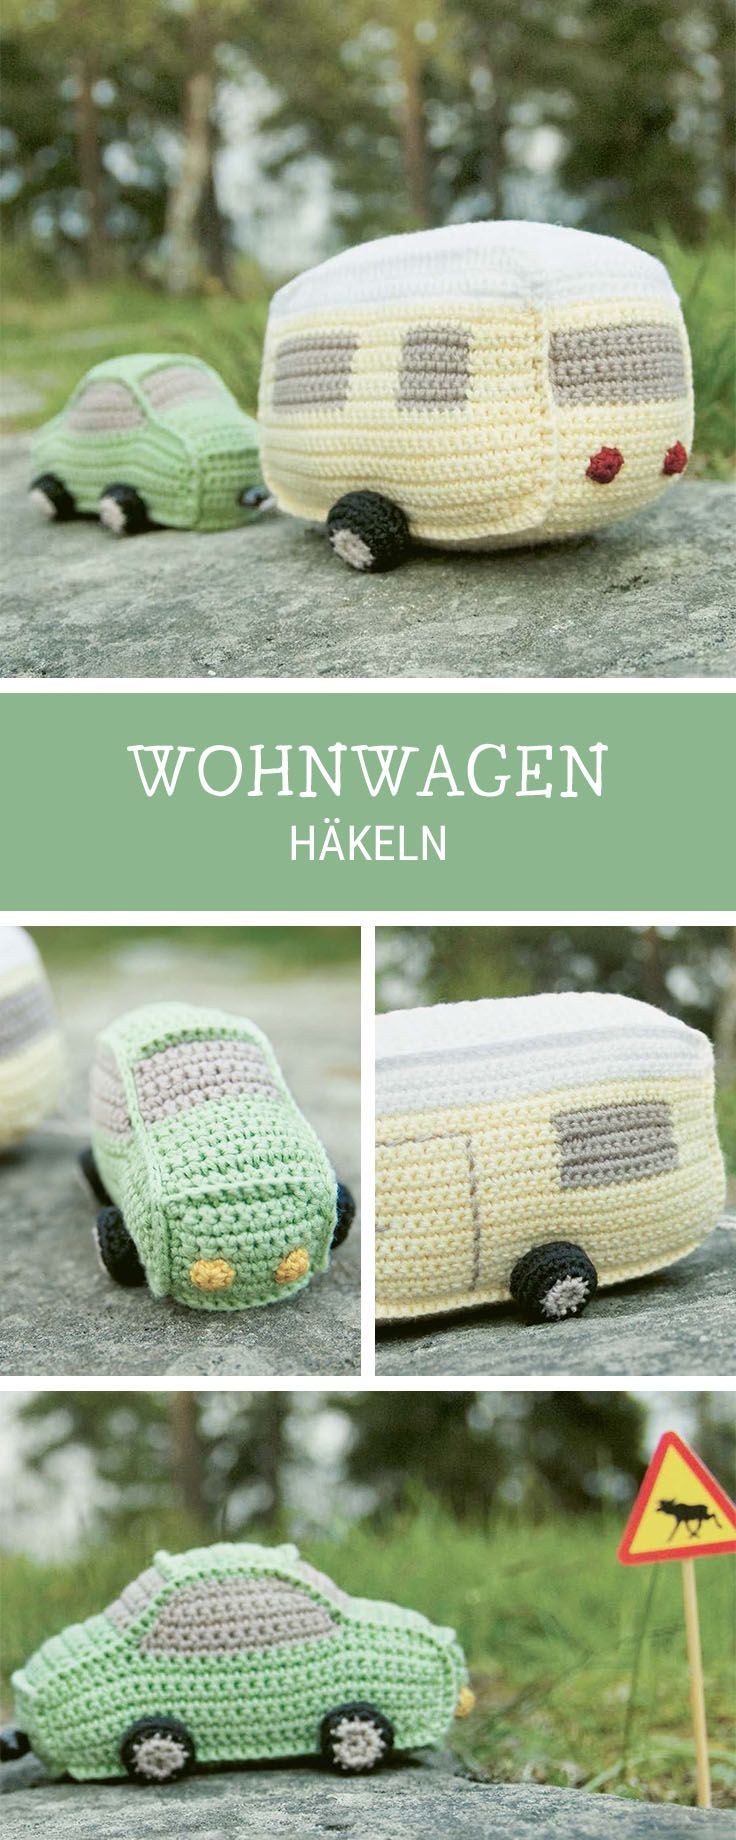 Auto Mit Wohnwagen Häkeln Amigurumi Idee Diy Crocheting Pattern